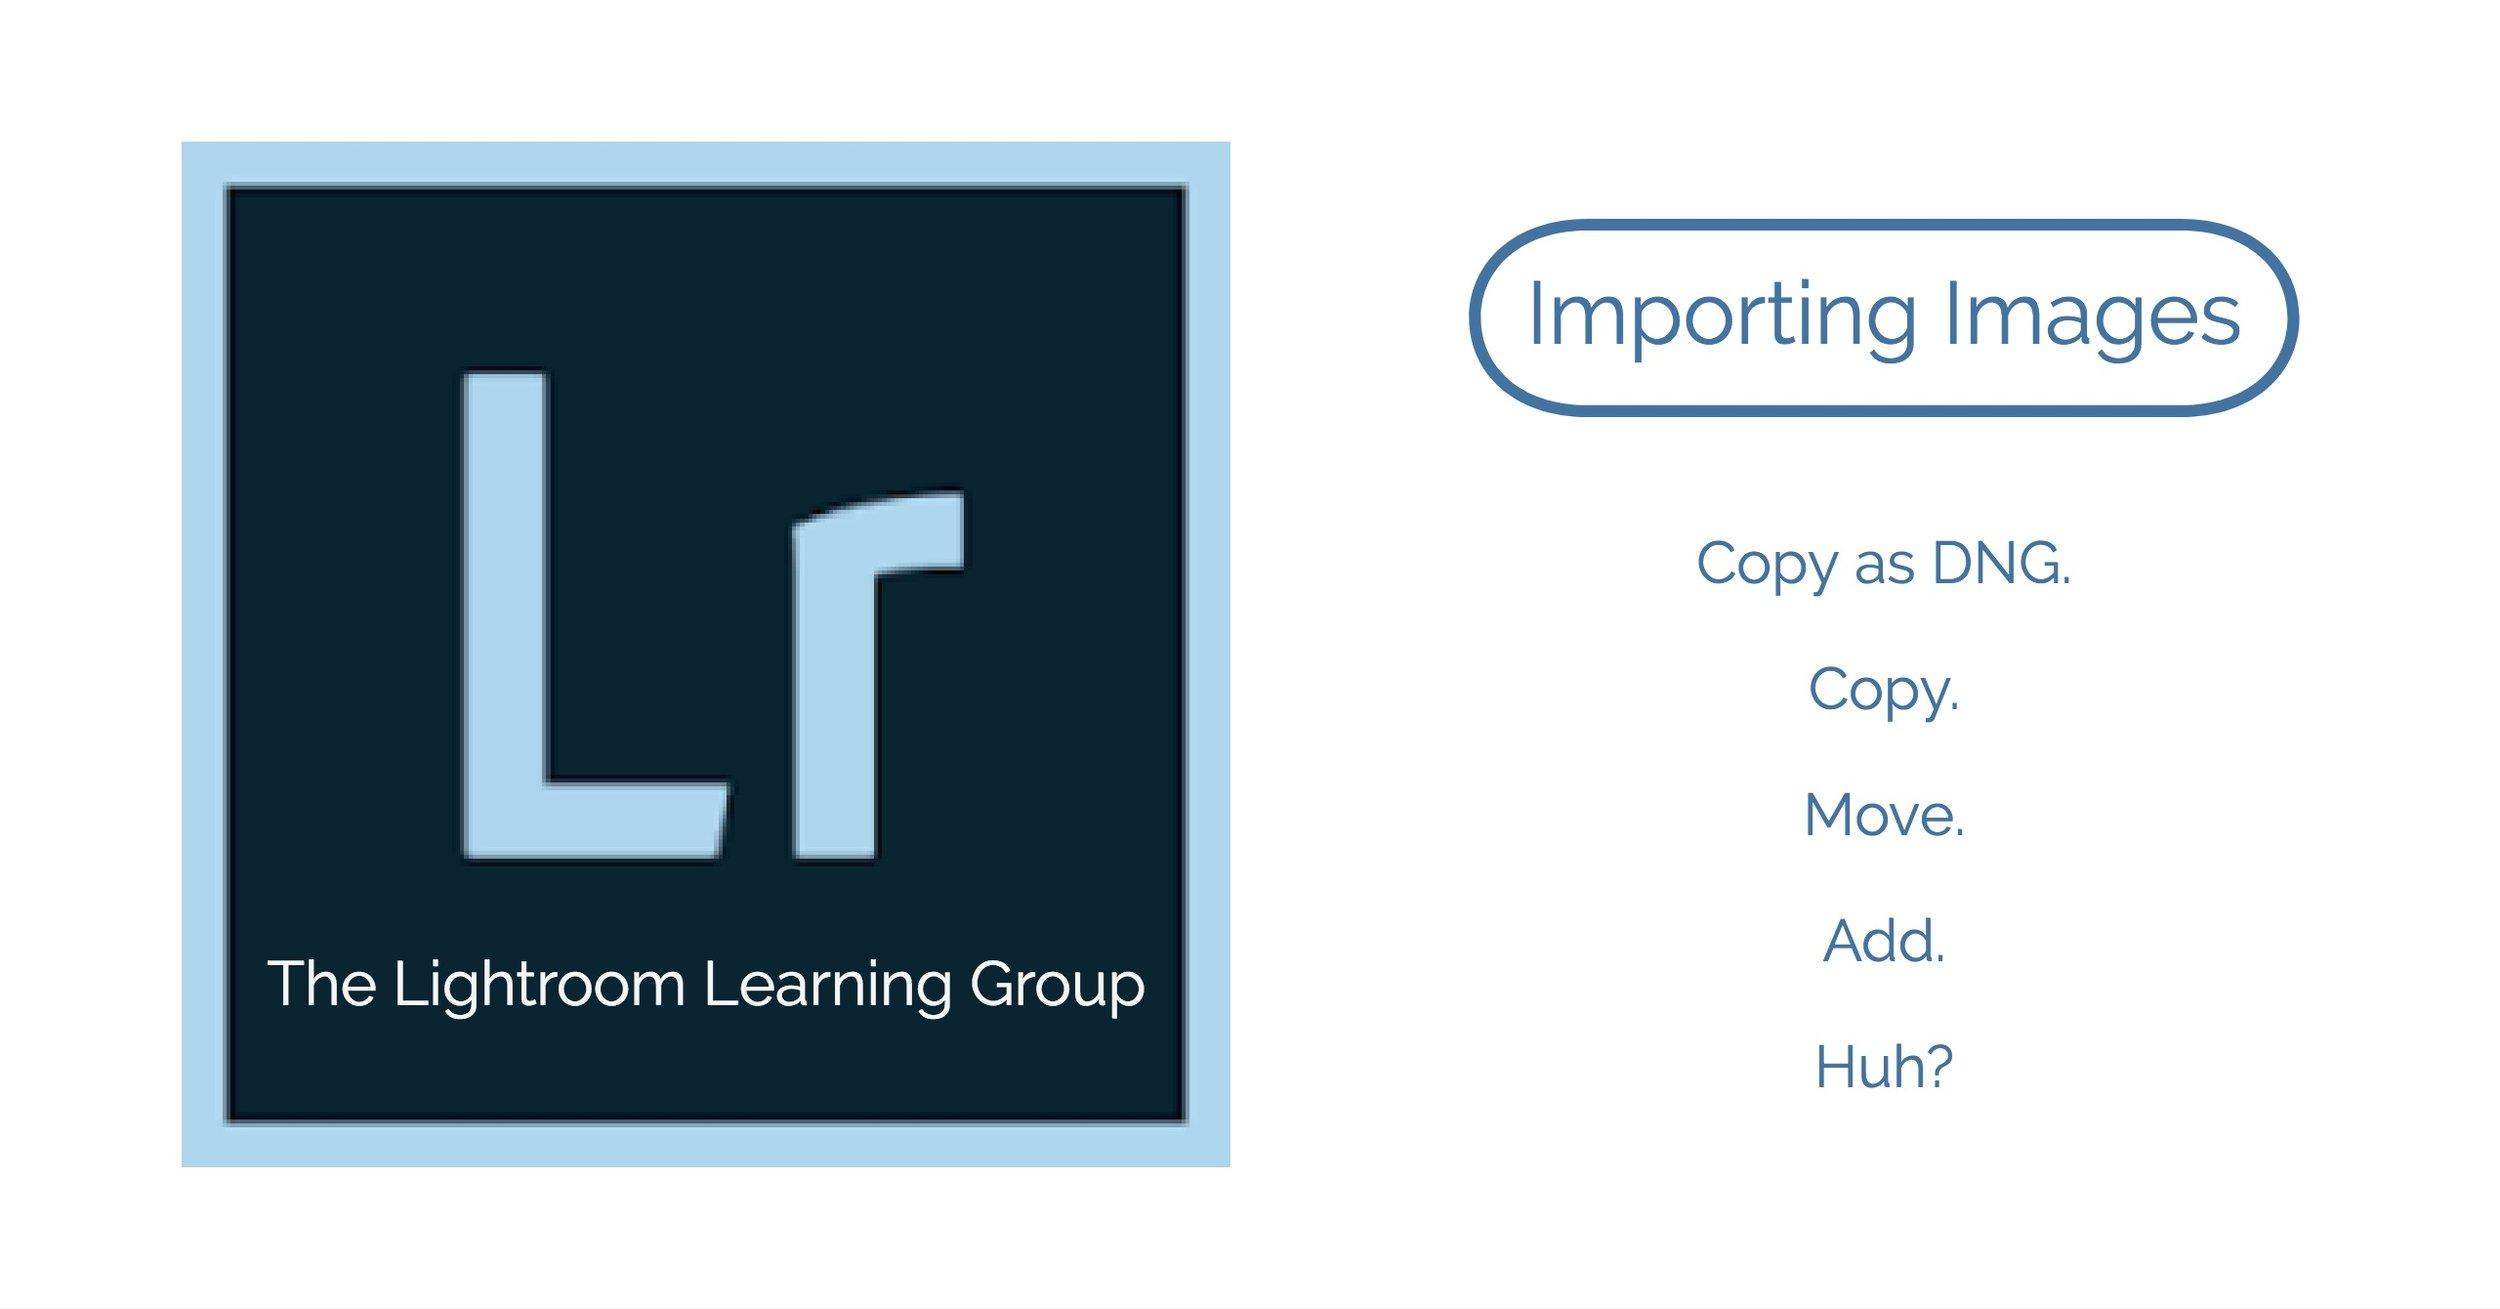 Import_link.jpg